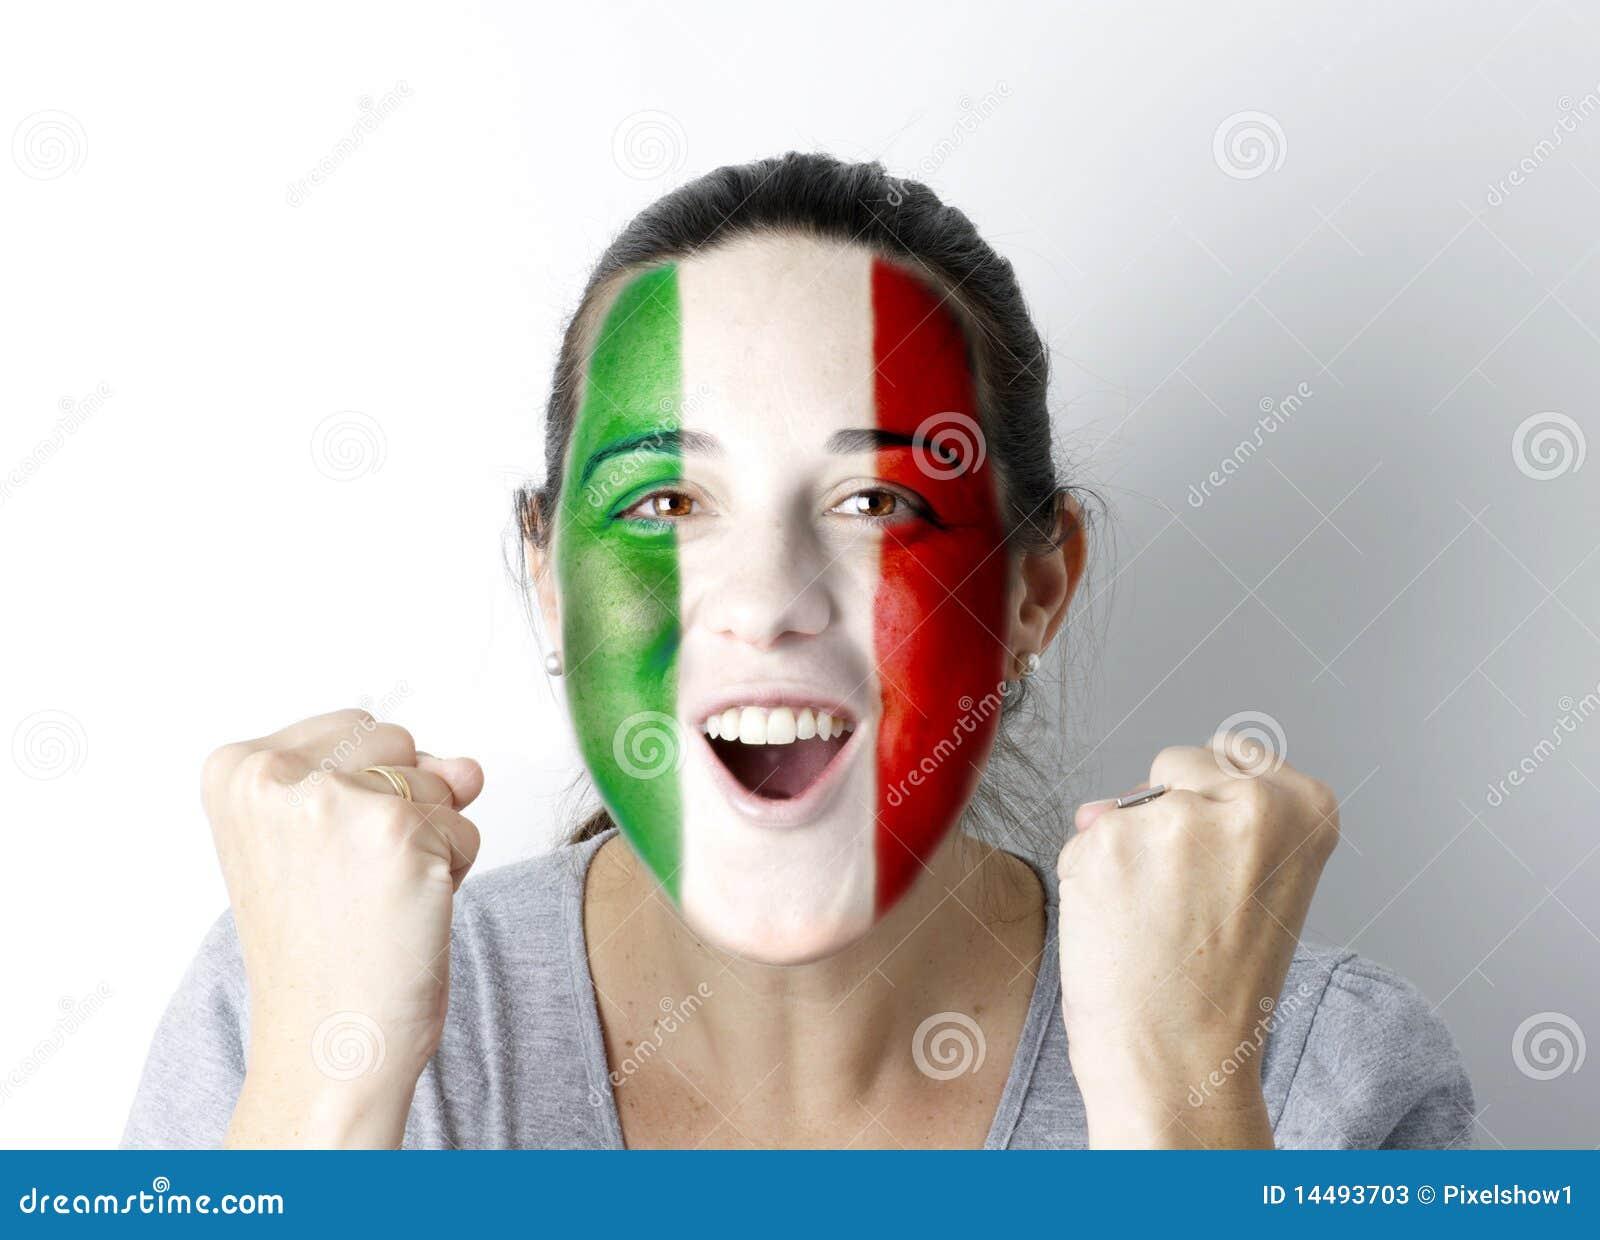 OBJETIVO gritando do ventilador italiano